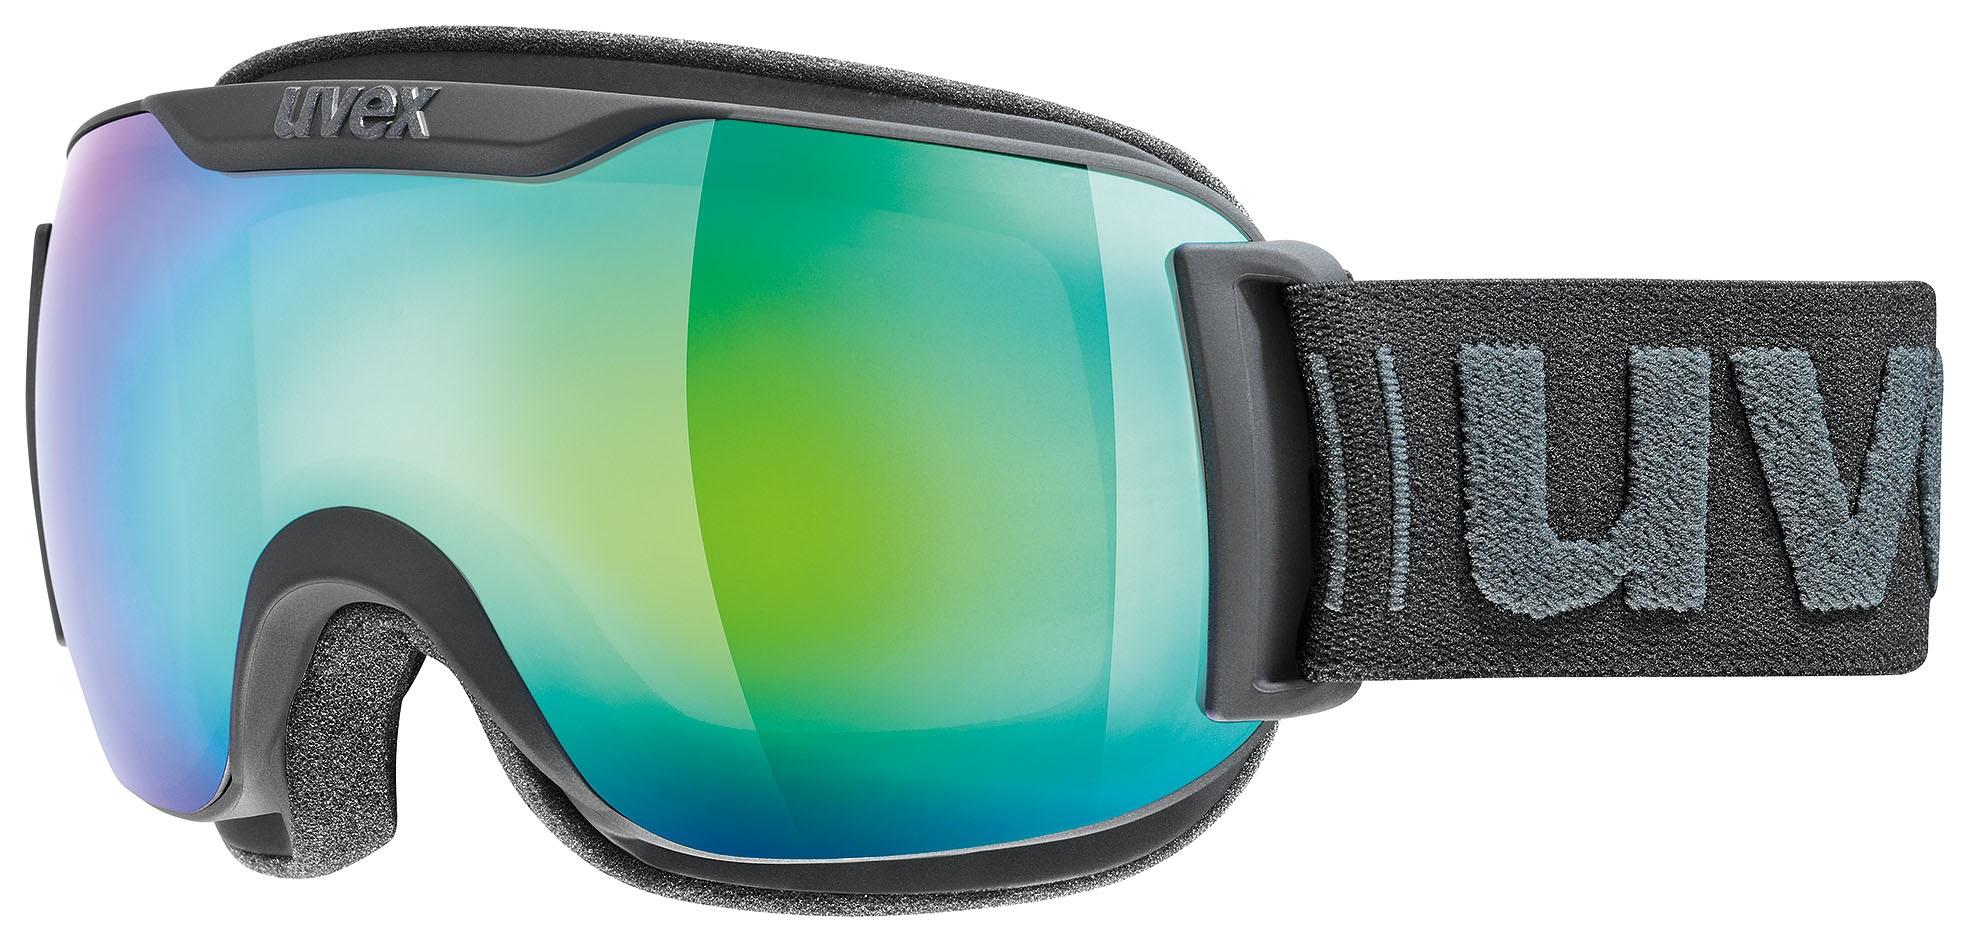 Uvex Downhill 2000 Mirror Green Lasergold Lite S3 2330